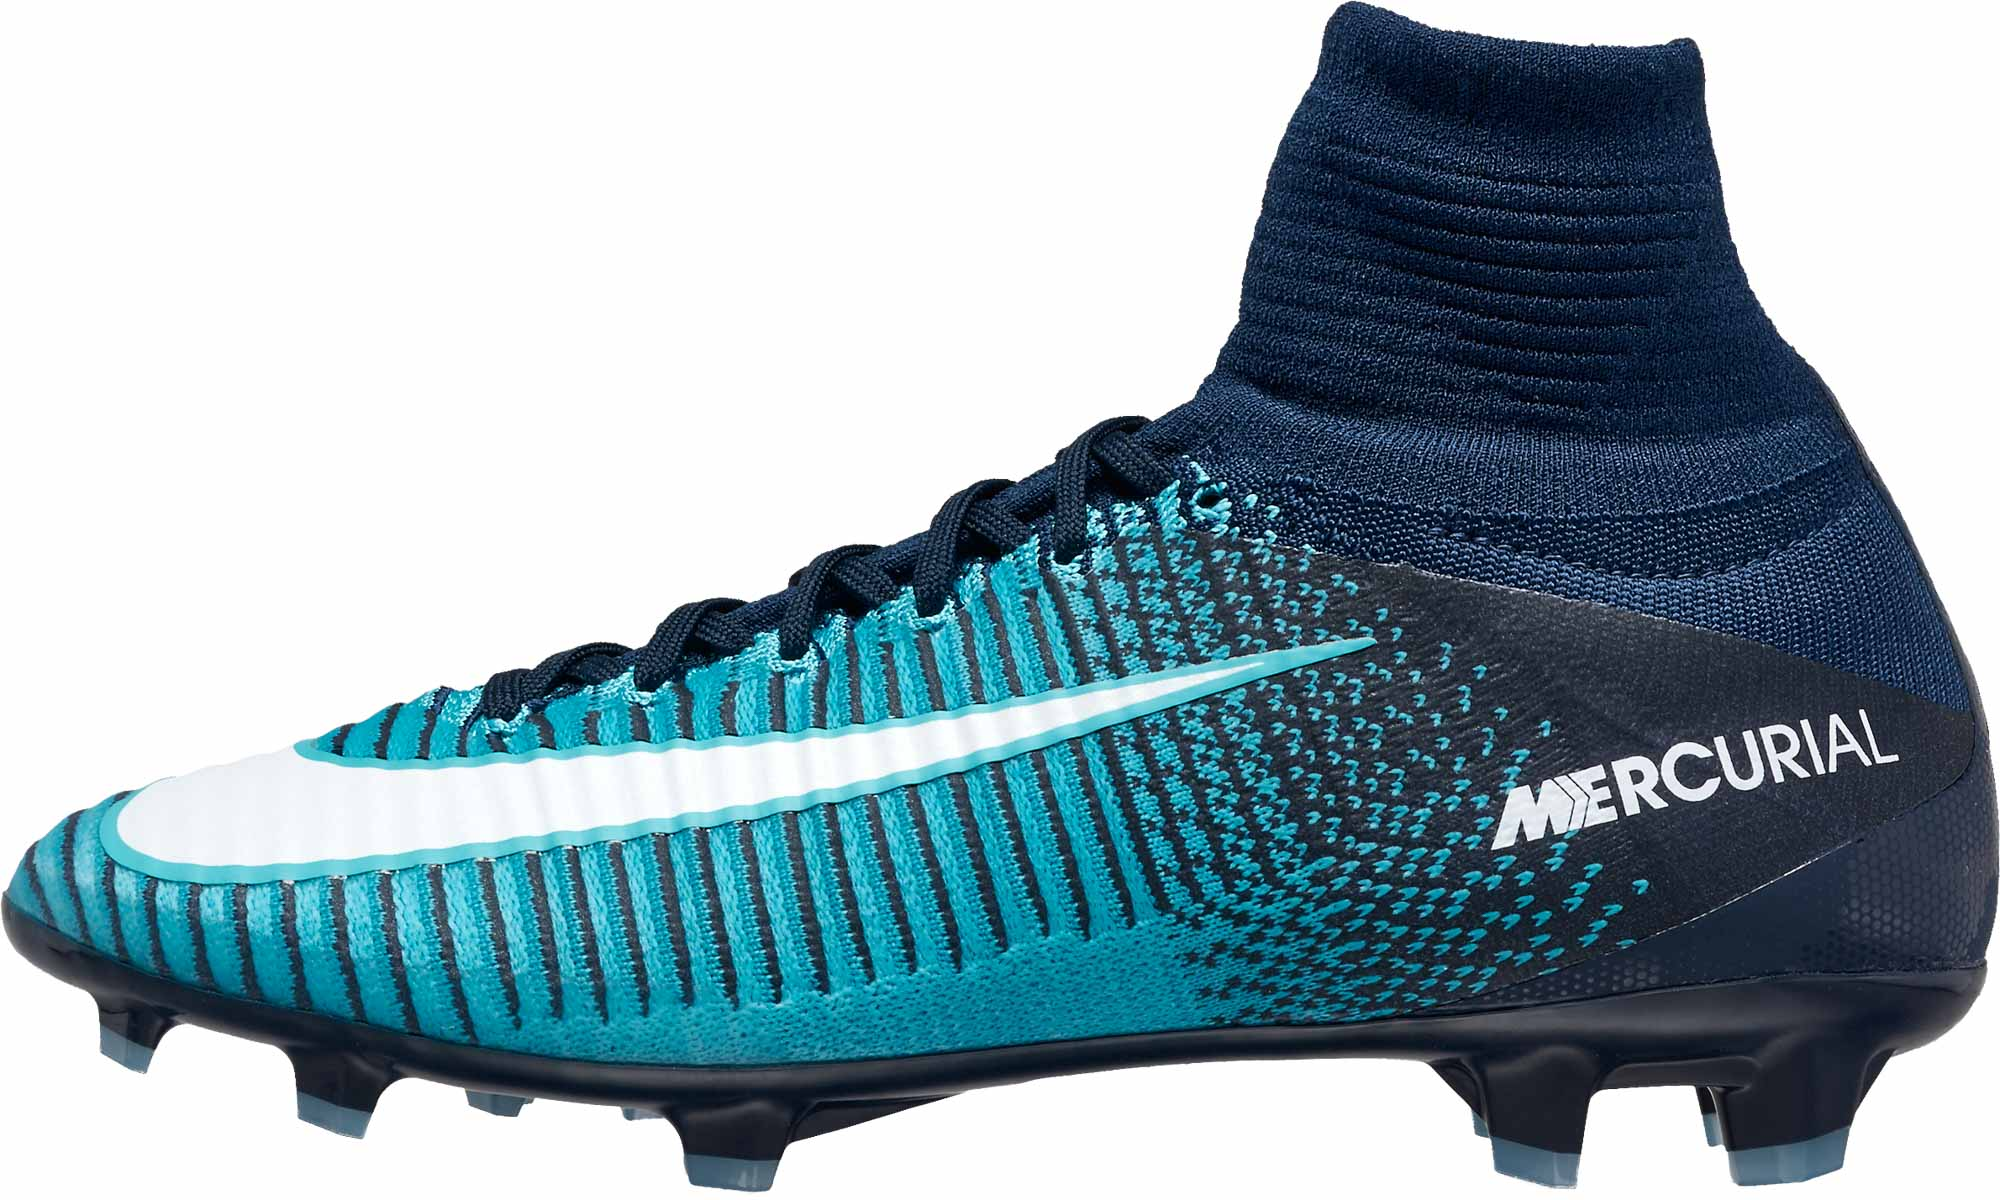 new style a26cc 11a30 Nike Kids Mercurial Superfly V FG - Obsidian/White - Soccer ...